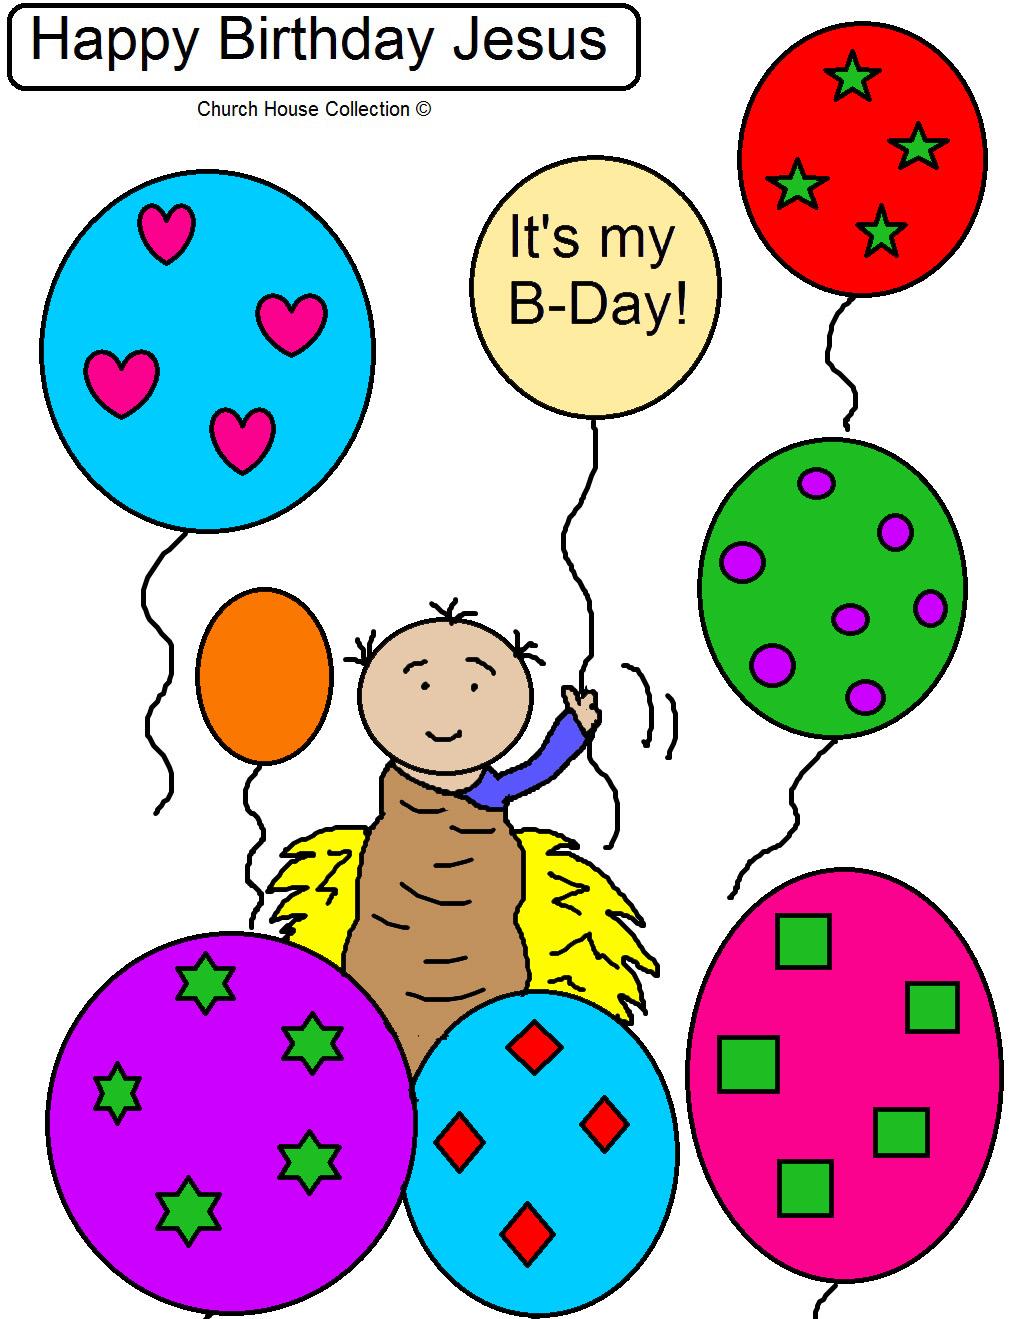 Happy Birthday Jesus Free Coloring Page | Fun365 | 1319x1019